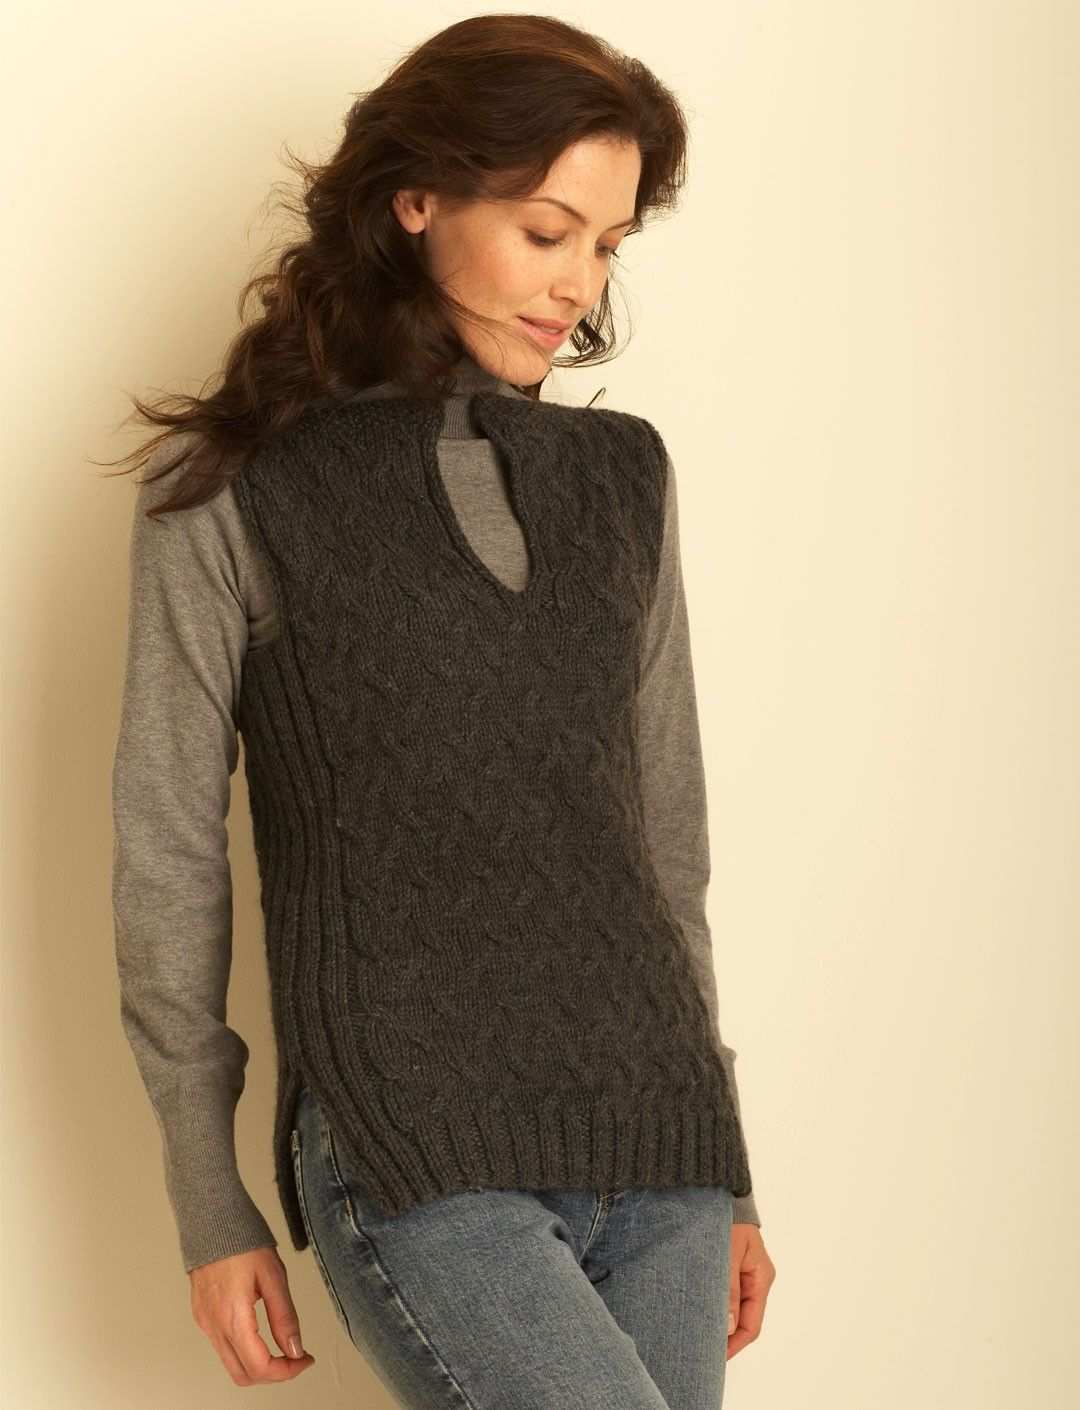 Yarnspirations Com Bernat Cable Vest Patterns